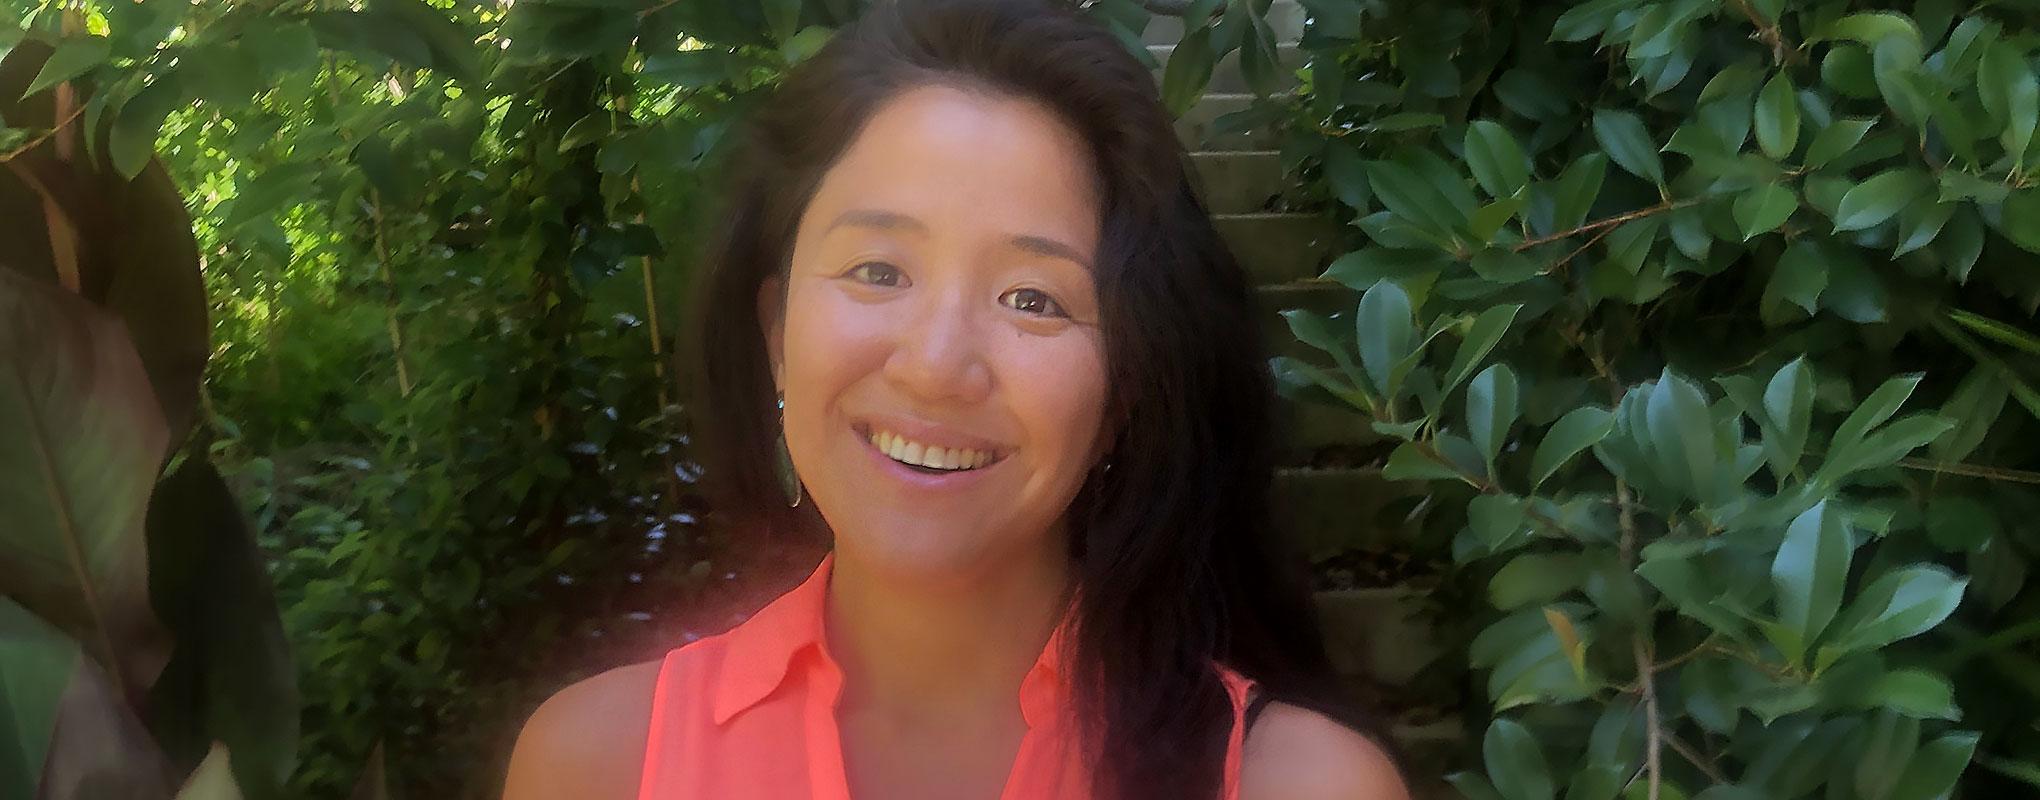 San Francisco State University grad student Yuri Madenokoji